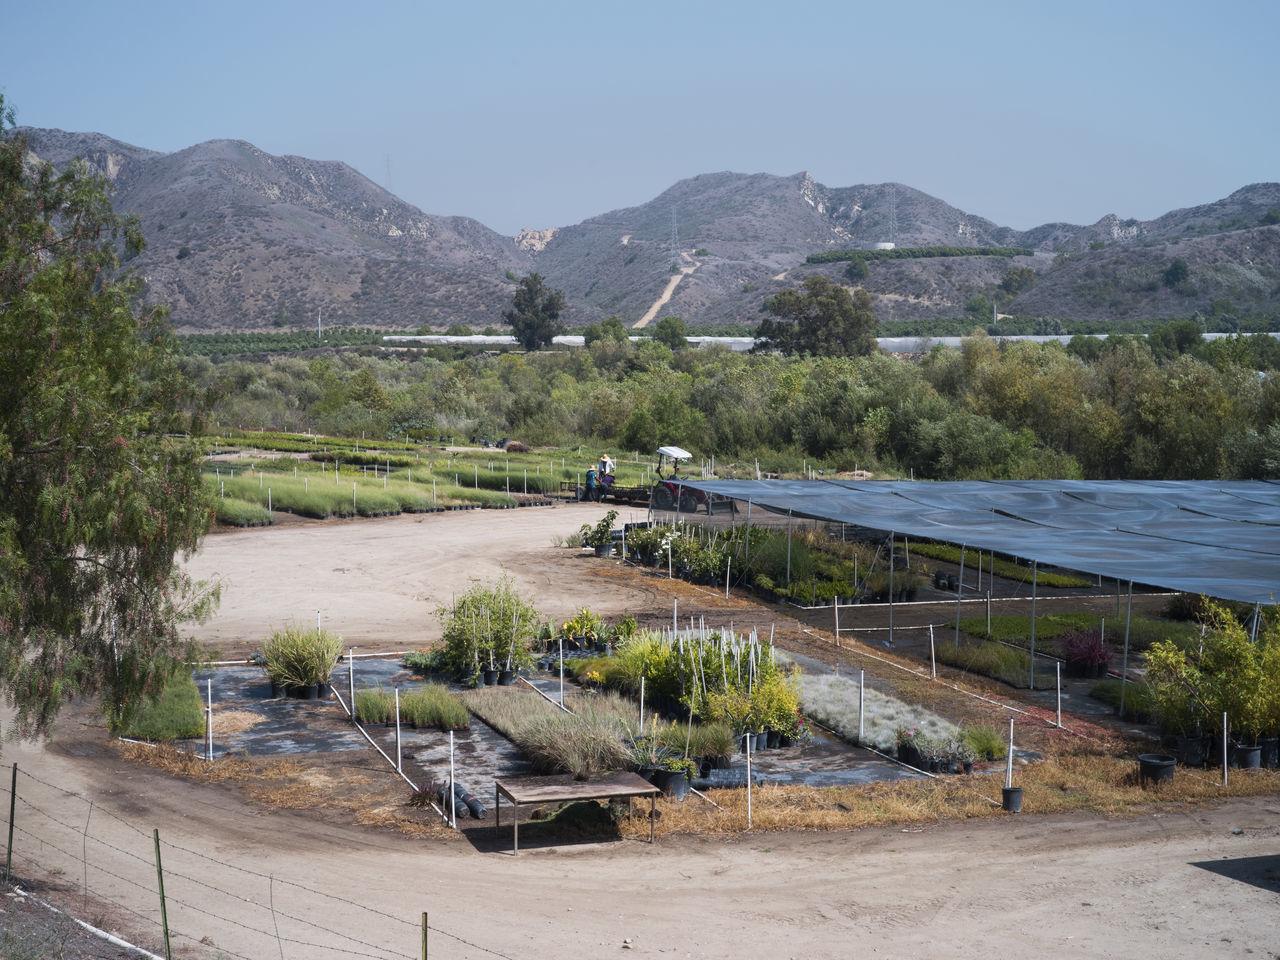 Agriculture California Drought Farm Labour Mexican Mountain Organic Plants